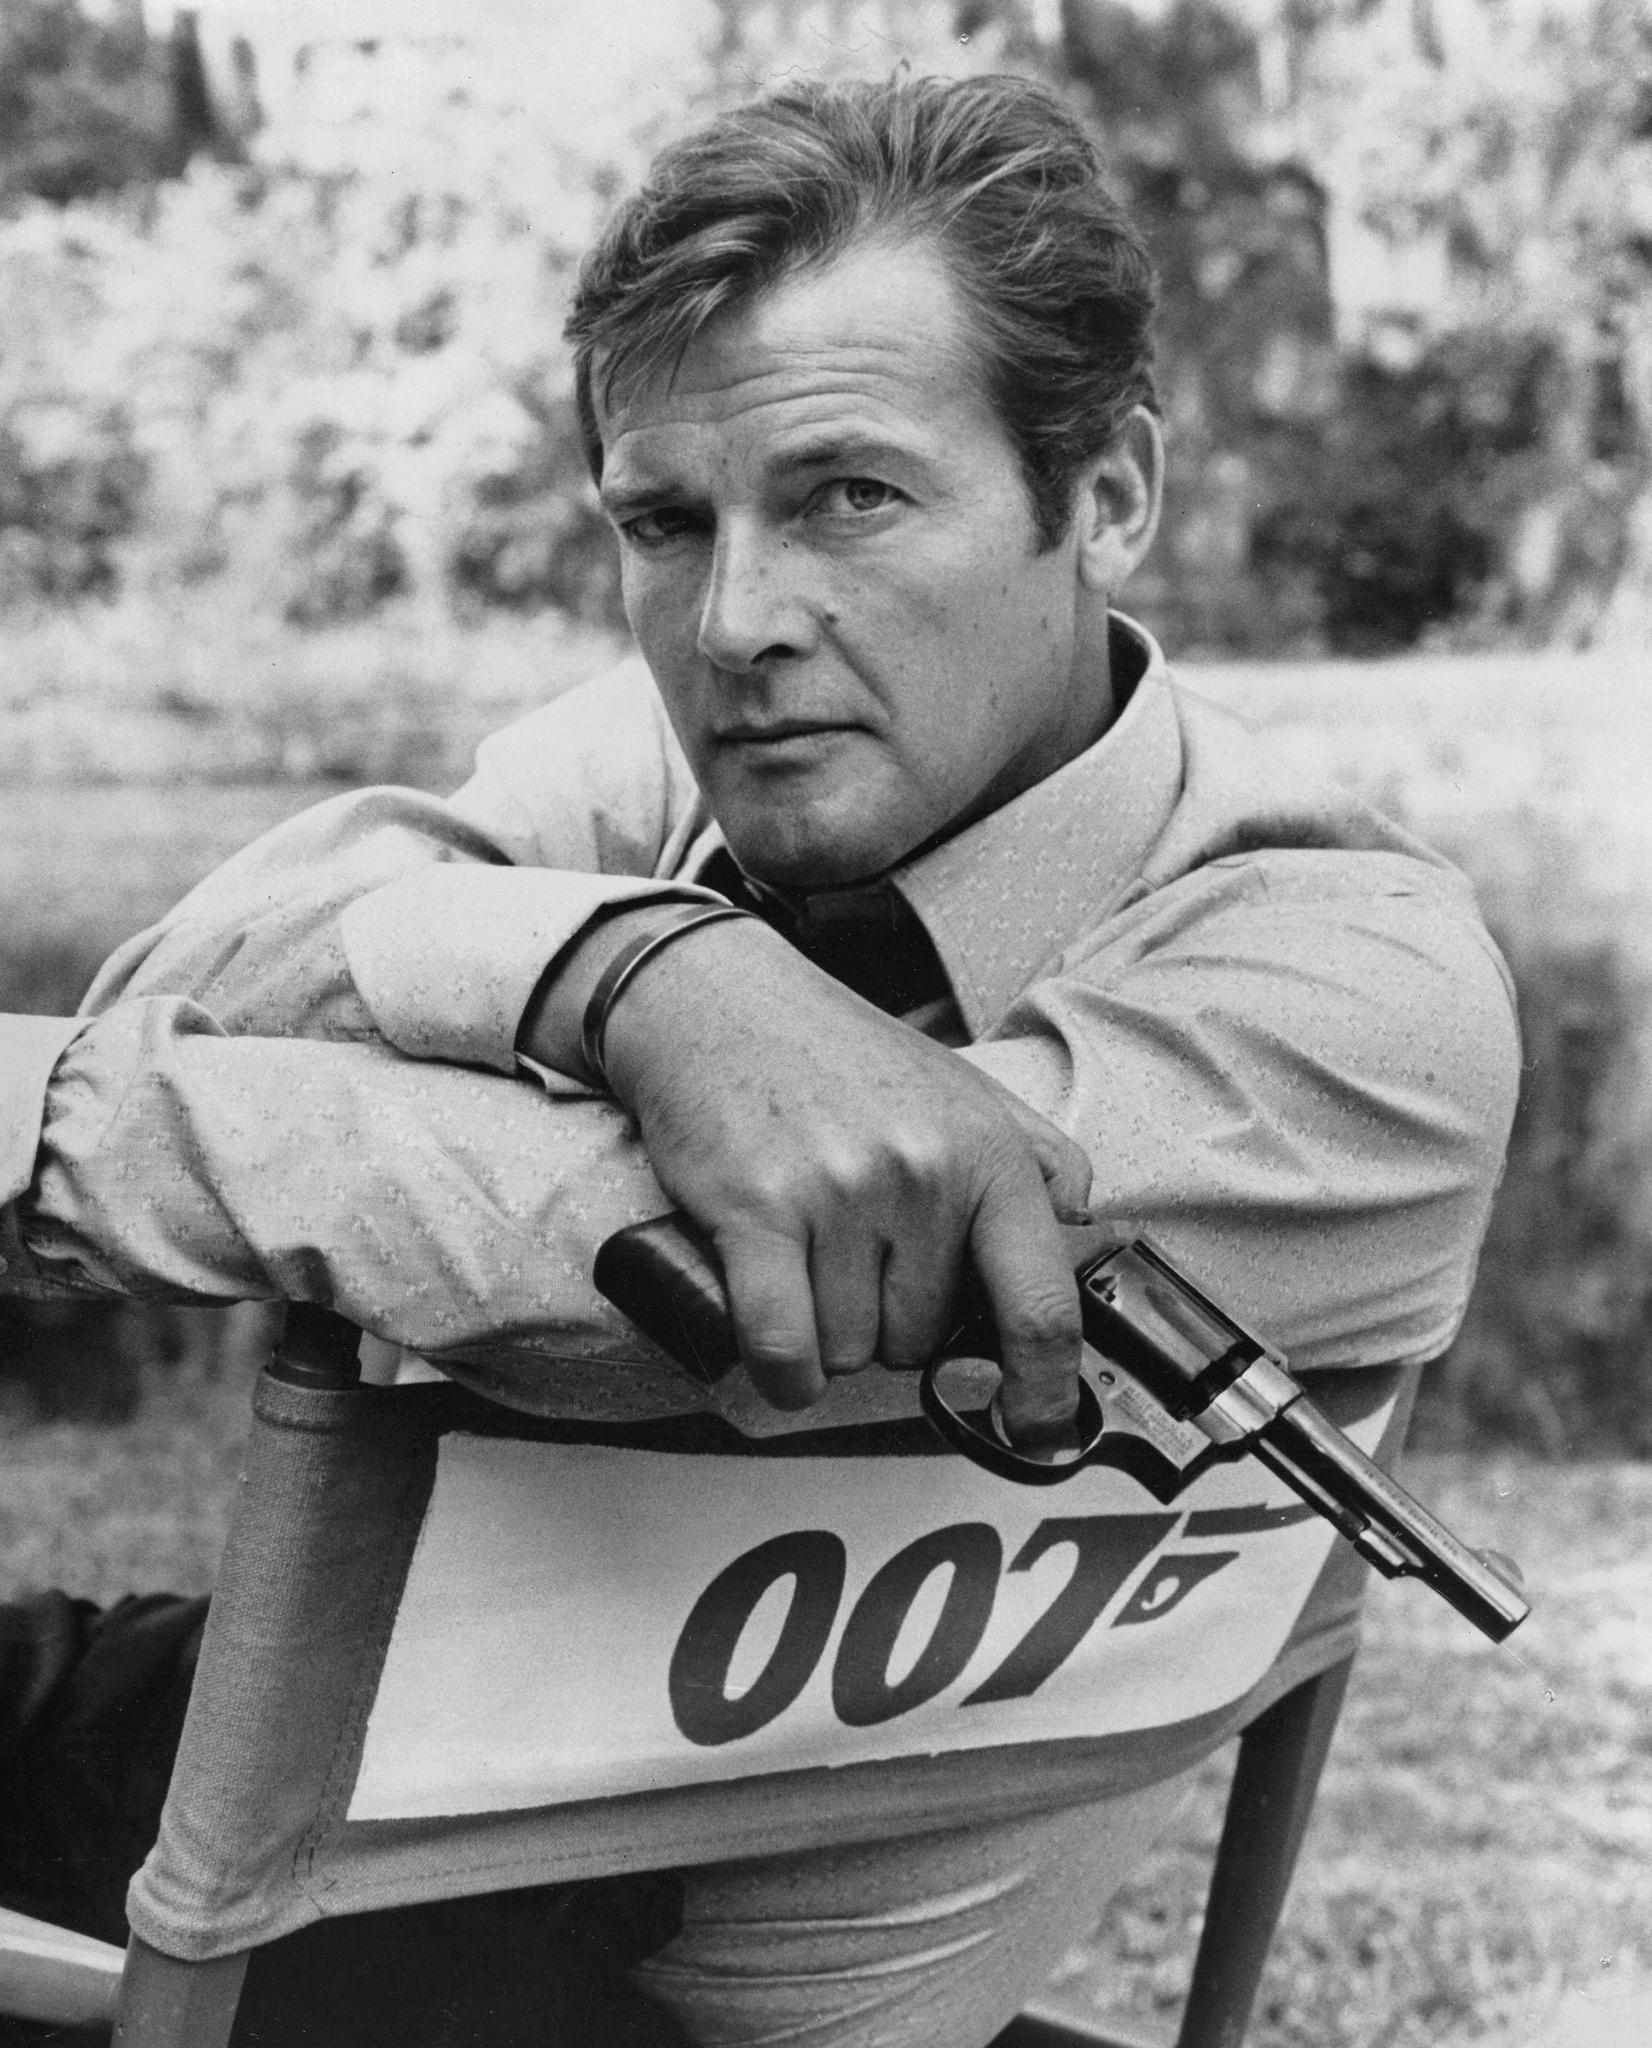 James-Bond-Darsteller Roger Moore ist tot